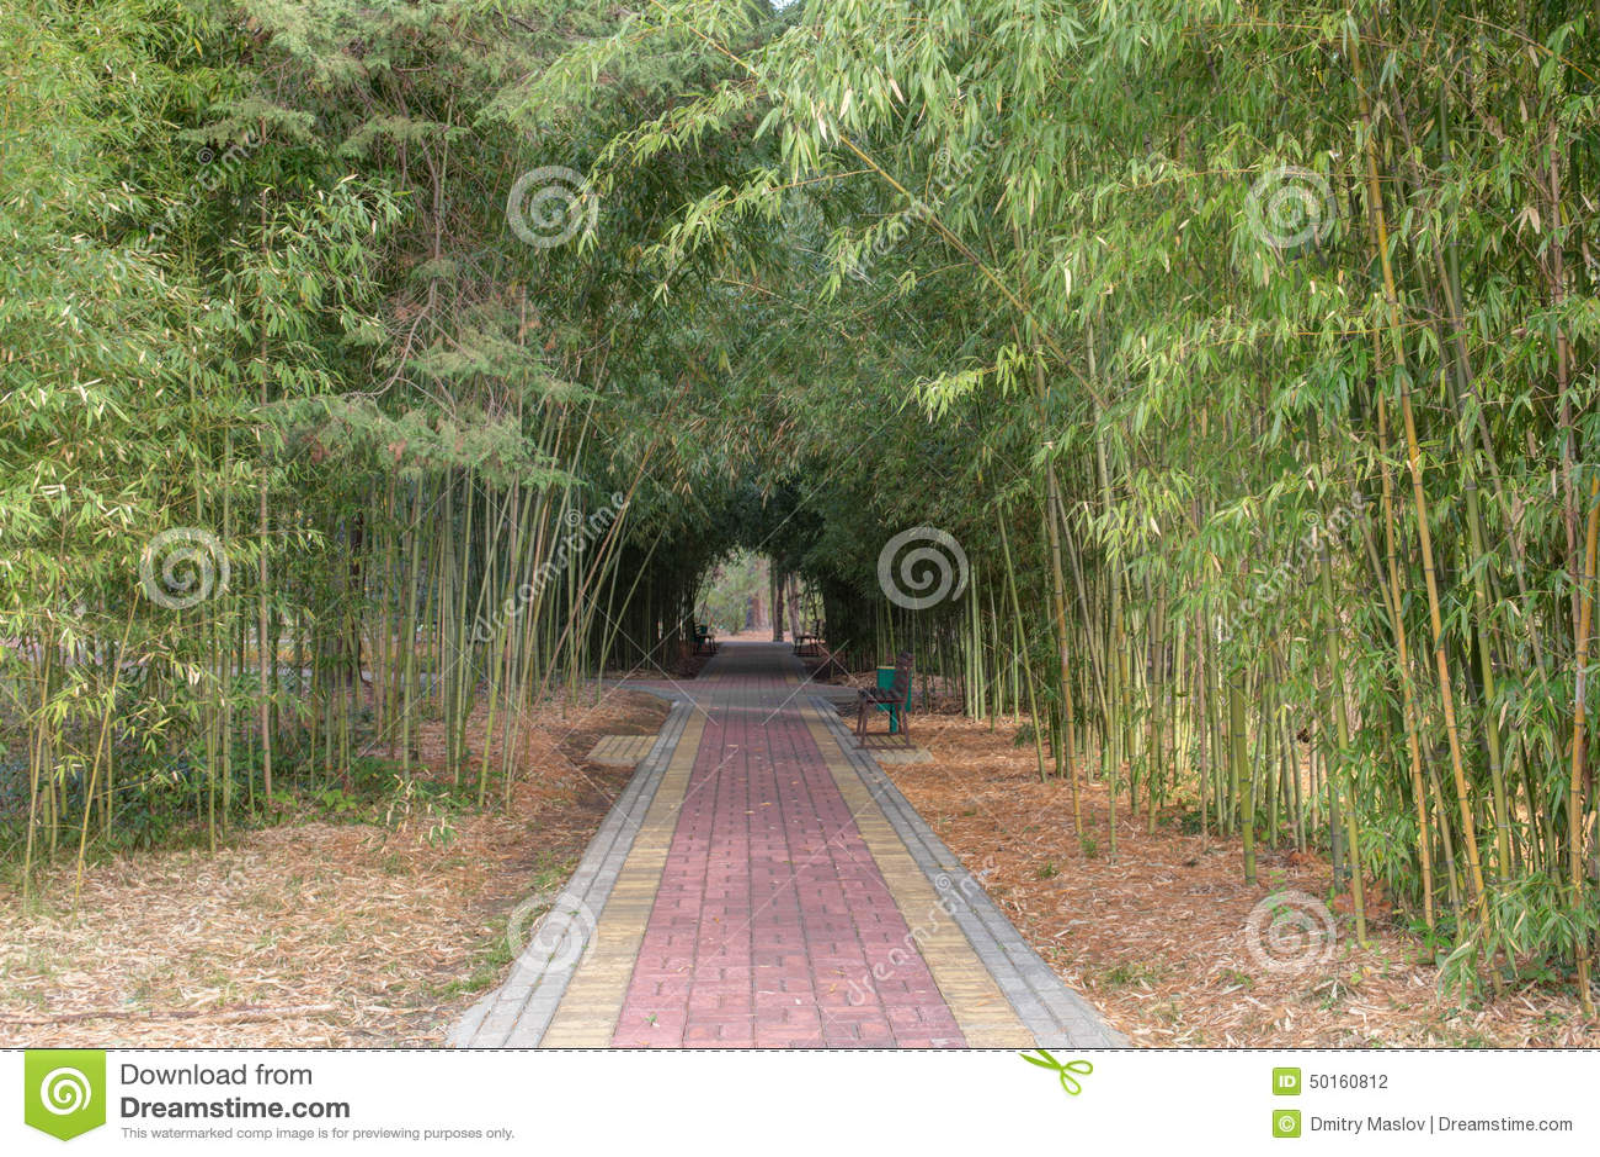 Garden Path Stock Photo Image 50160812